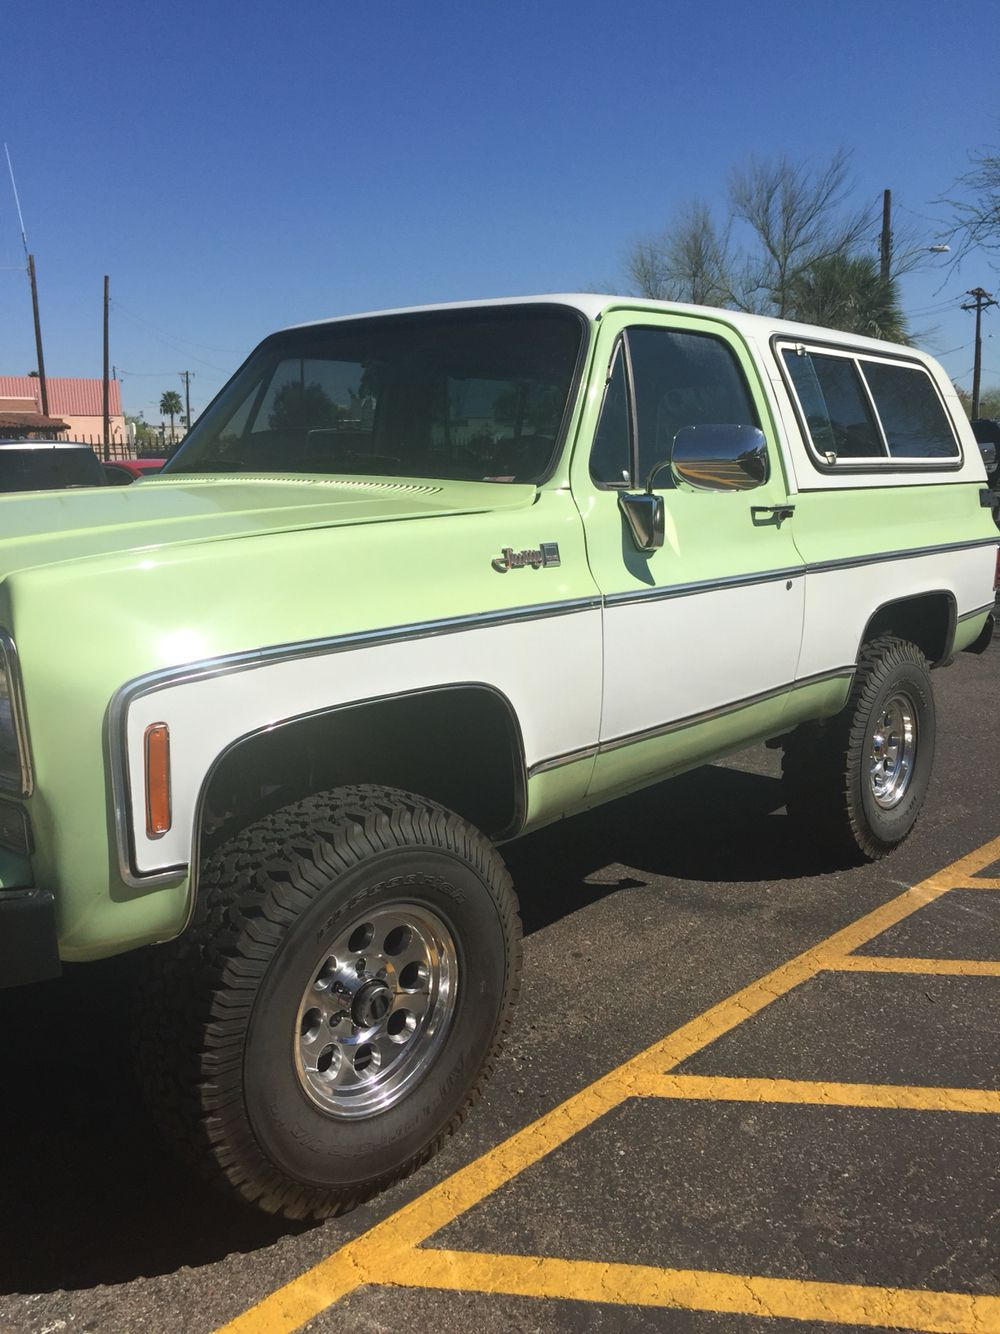 1976 Gmc Jimmy Original Color Willoway Green Gmc Ls1 Engine